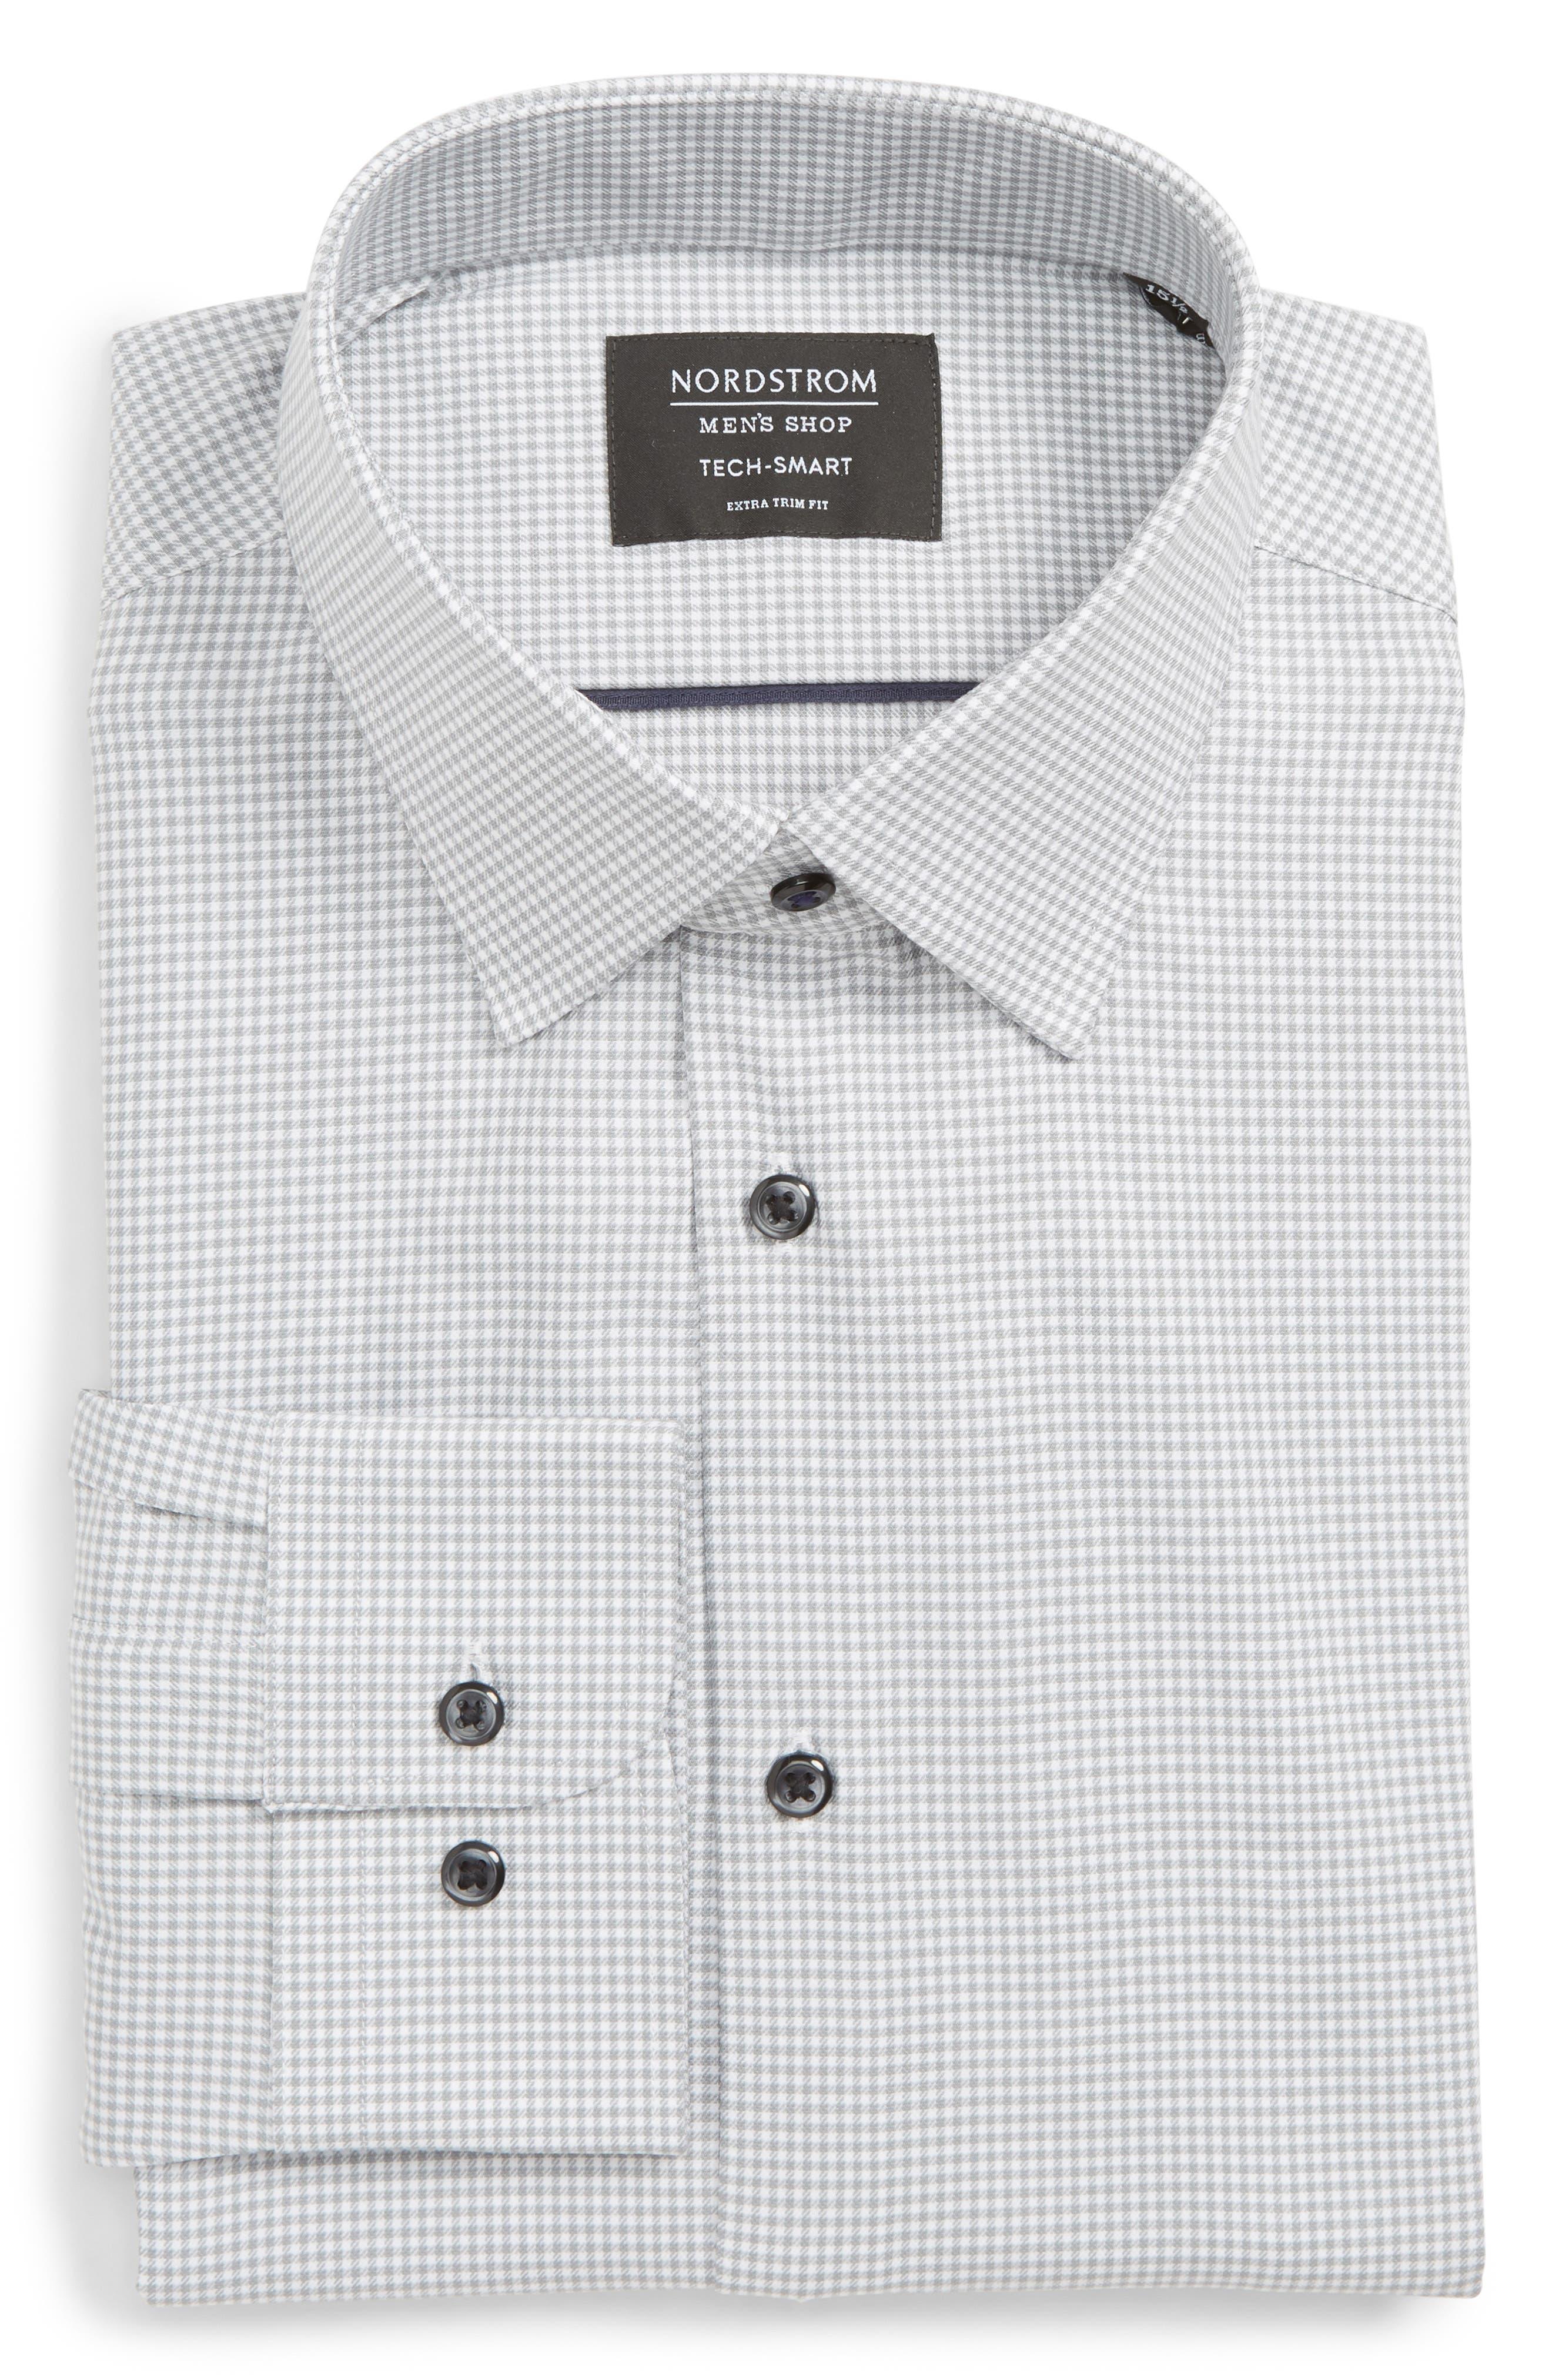 Tech-Smart Extra Trim Fit Stretch Check Dress Shirt,                             Main thumbnail 1, color,                             GREY SLEET